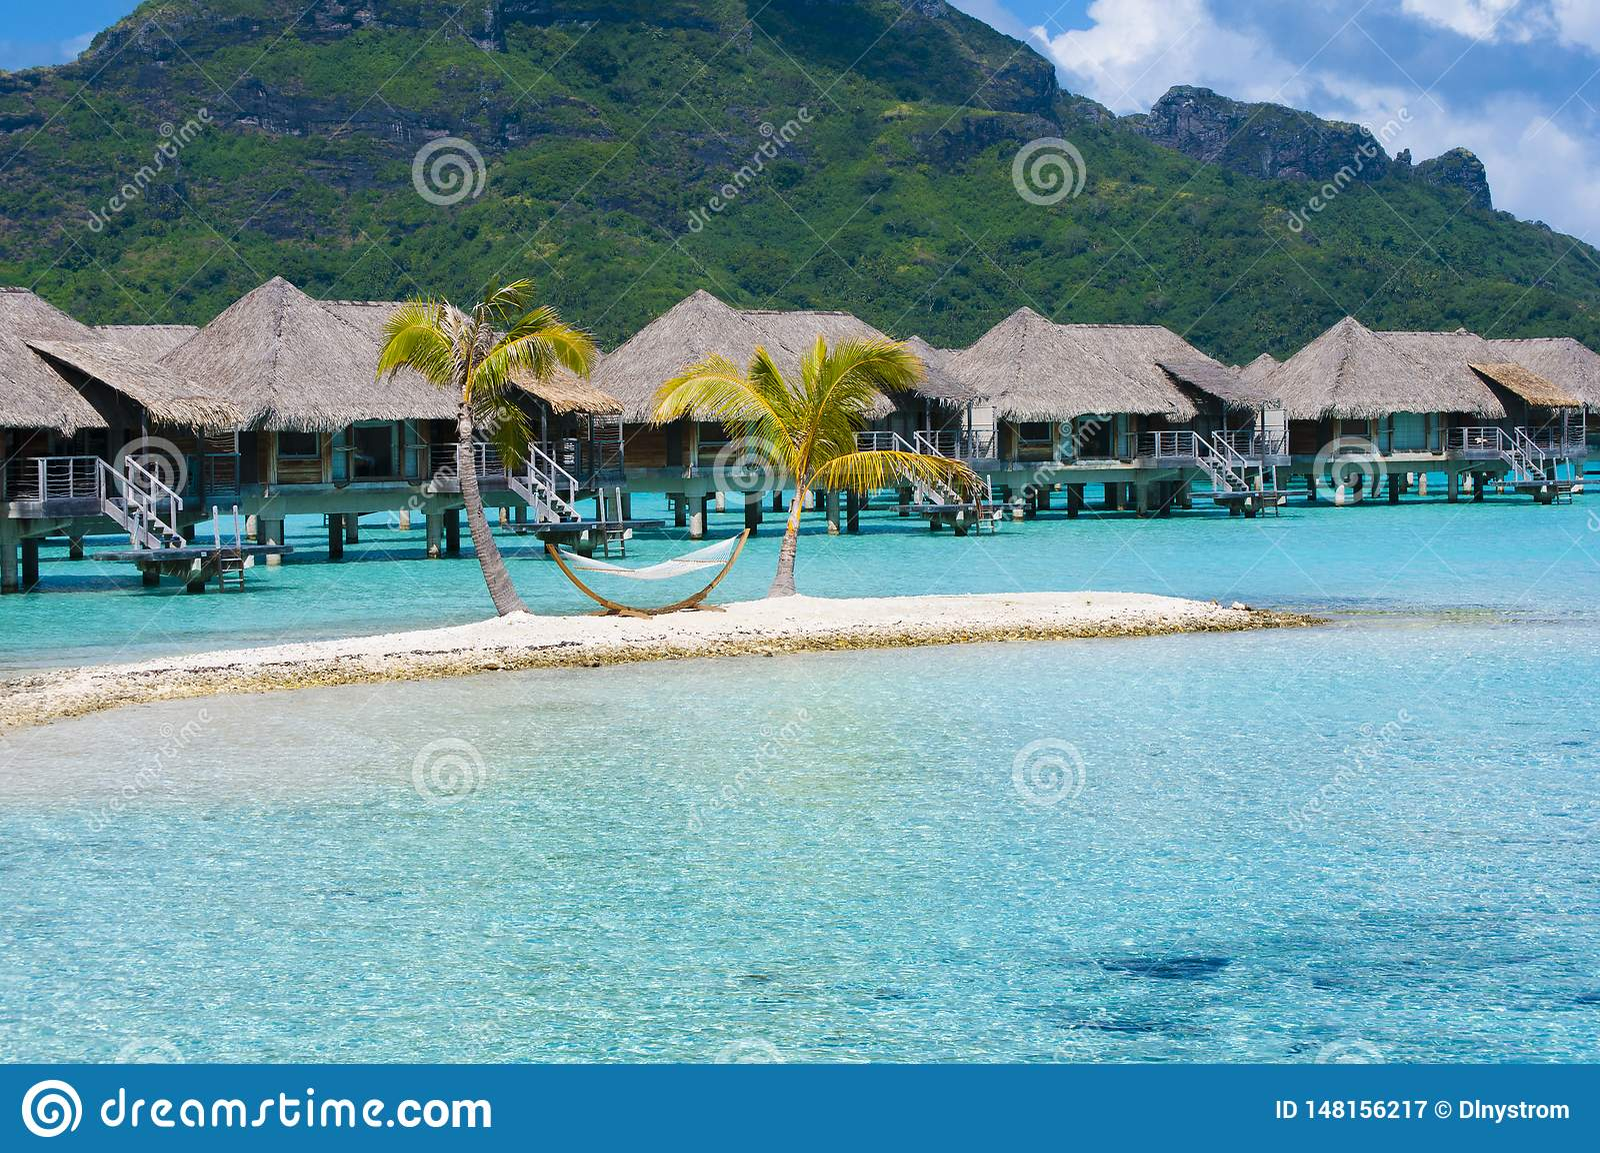 Overwater Bungalow And Hammock On Island In Bora Bora Stock